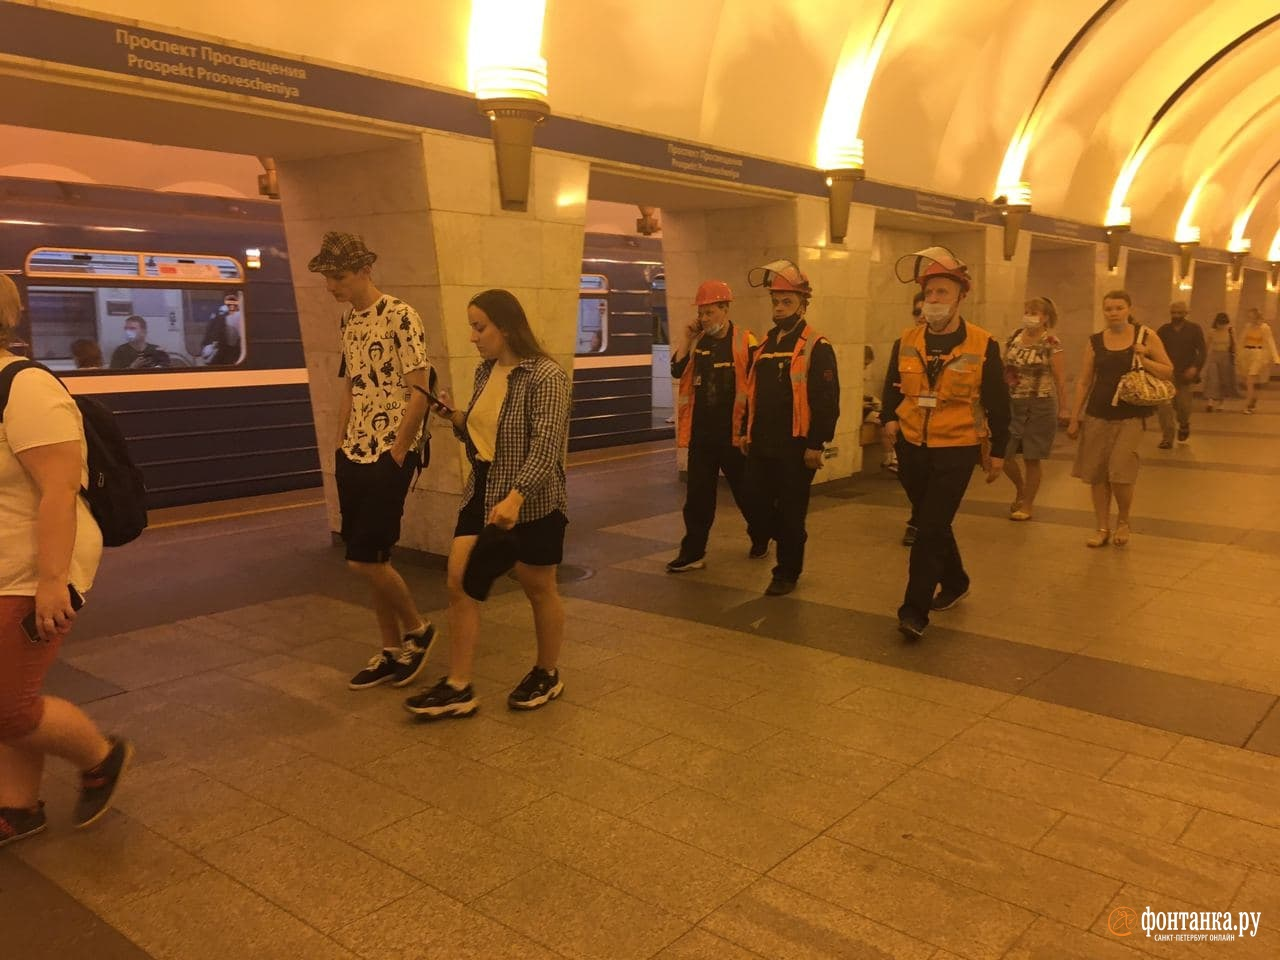 Сотрудники метро ходят по станции.